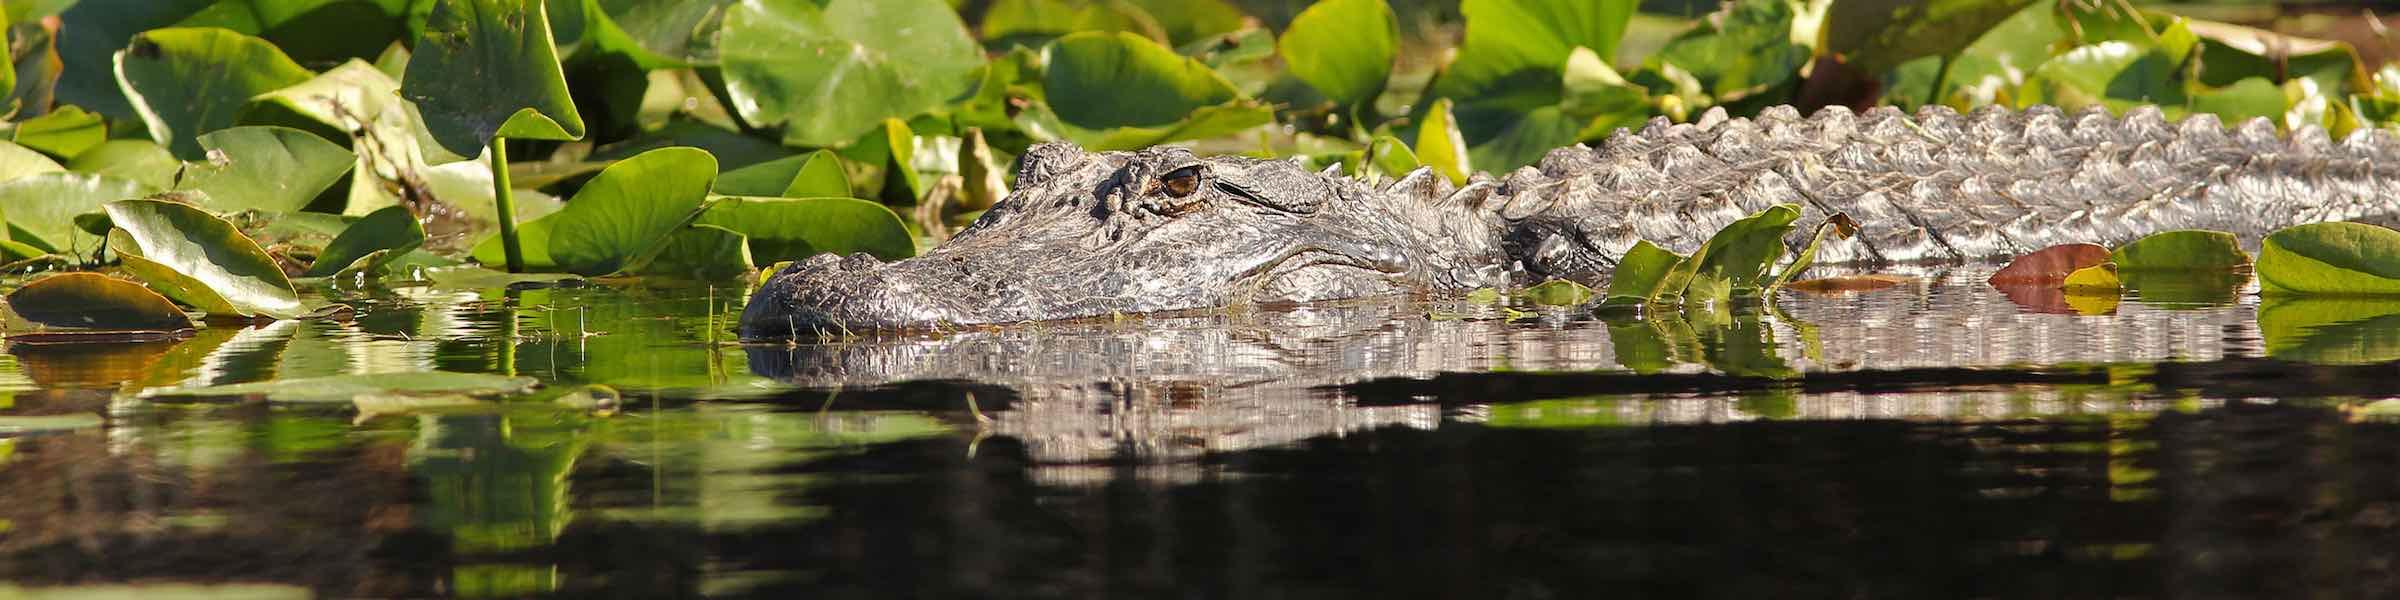 Alligator in the swamp.